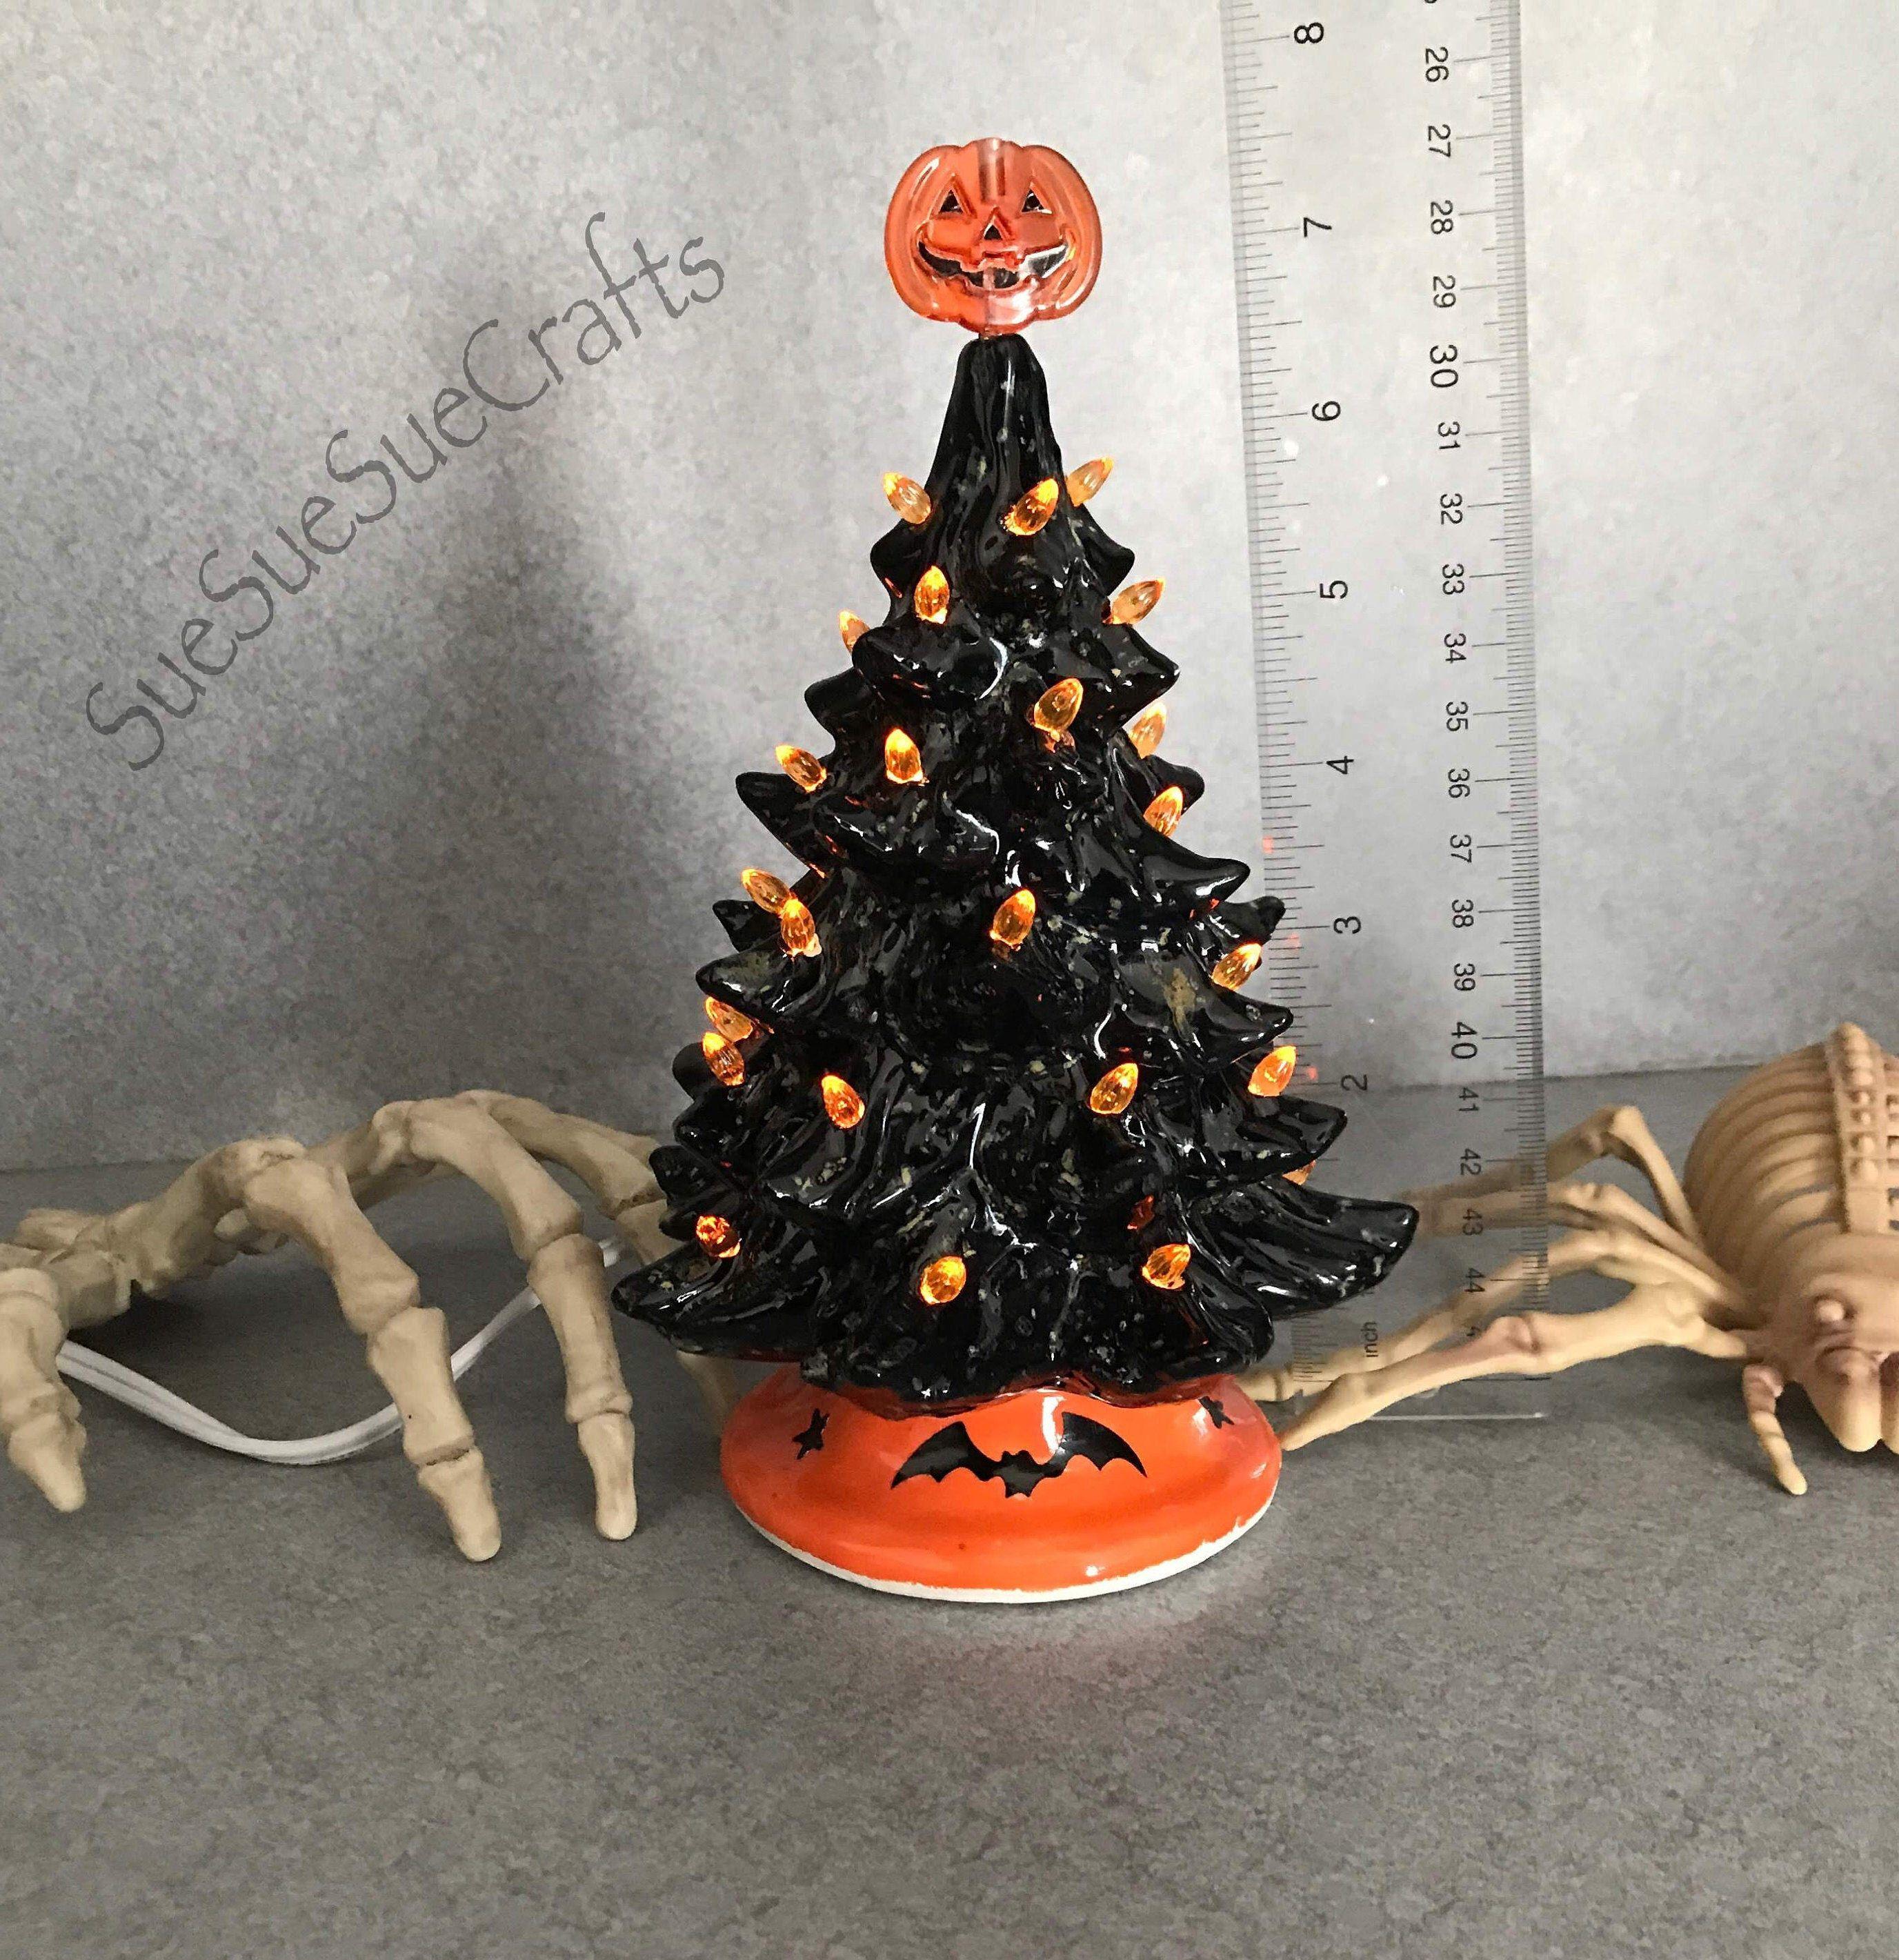 Halloween Tree, Ceramic night light, Small 7 inch, 7 Boo